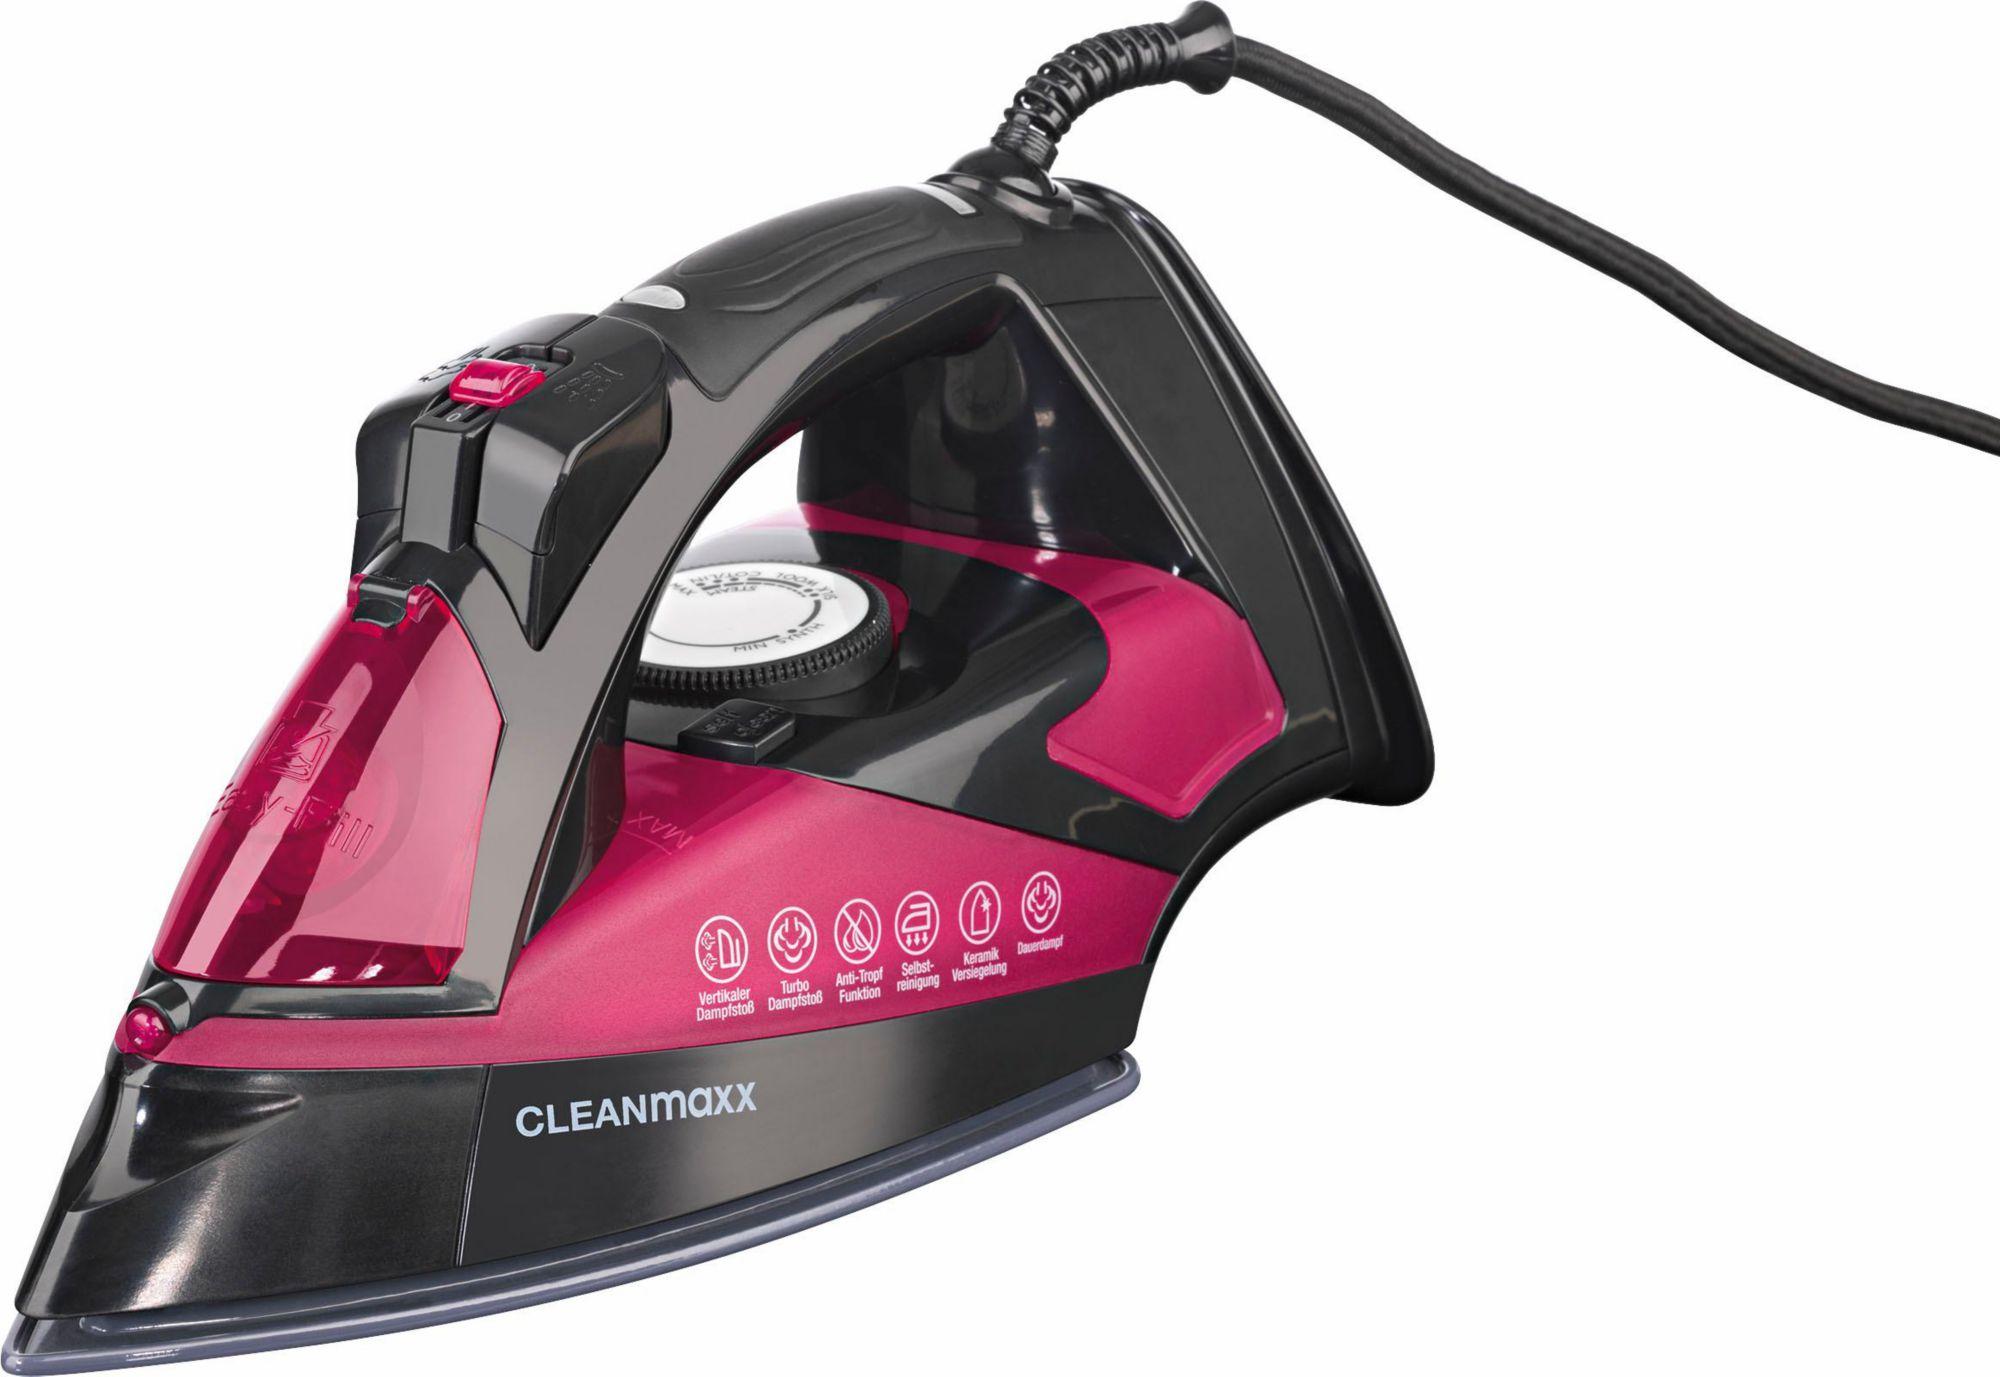 CLEAN MAXX Clean Maxx Dampfbügeleisen, Nano-Keramik, 2600 Watt